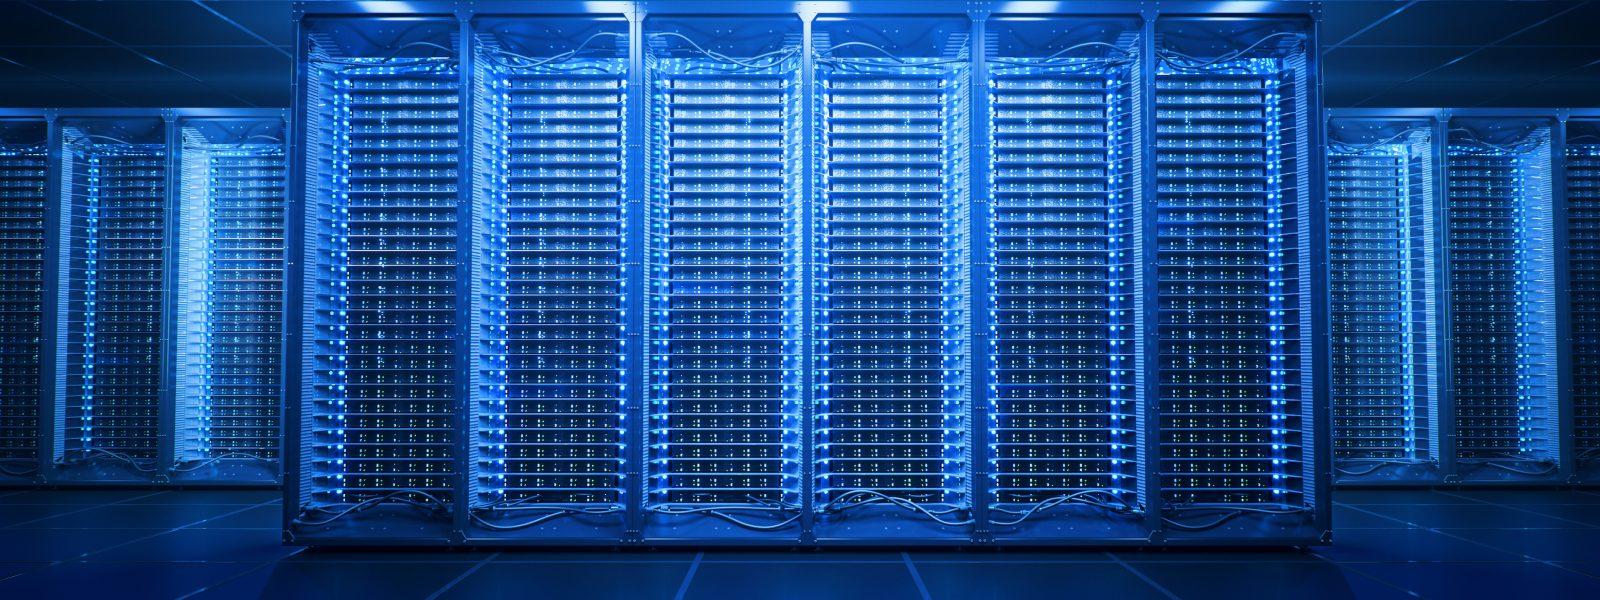 Server room in data center or server room data center. Hosting services. 3d rendering